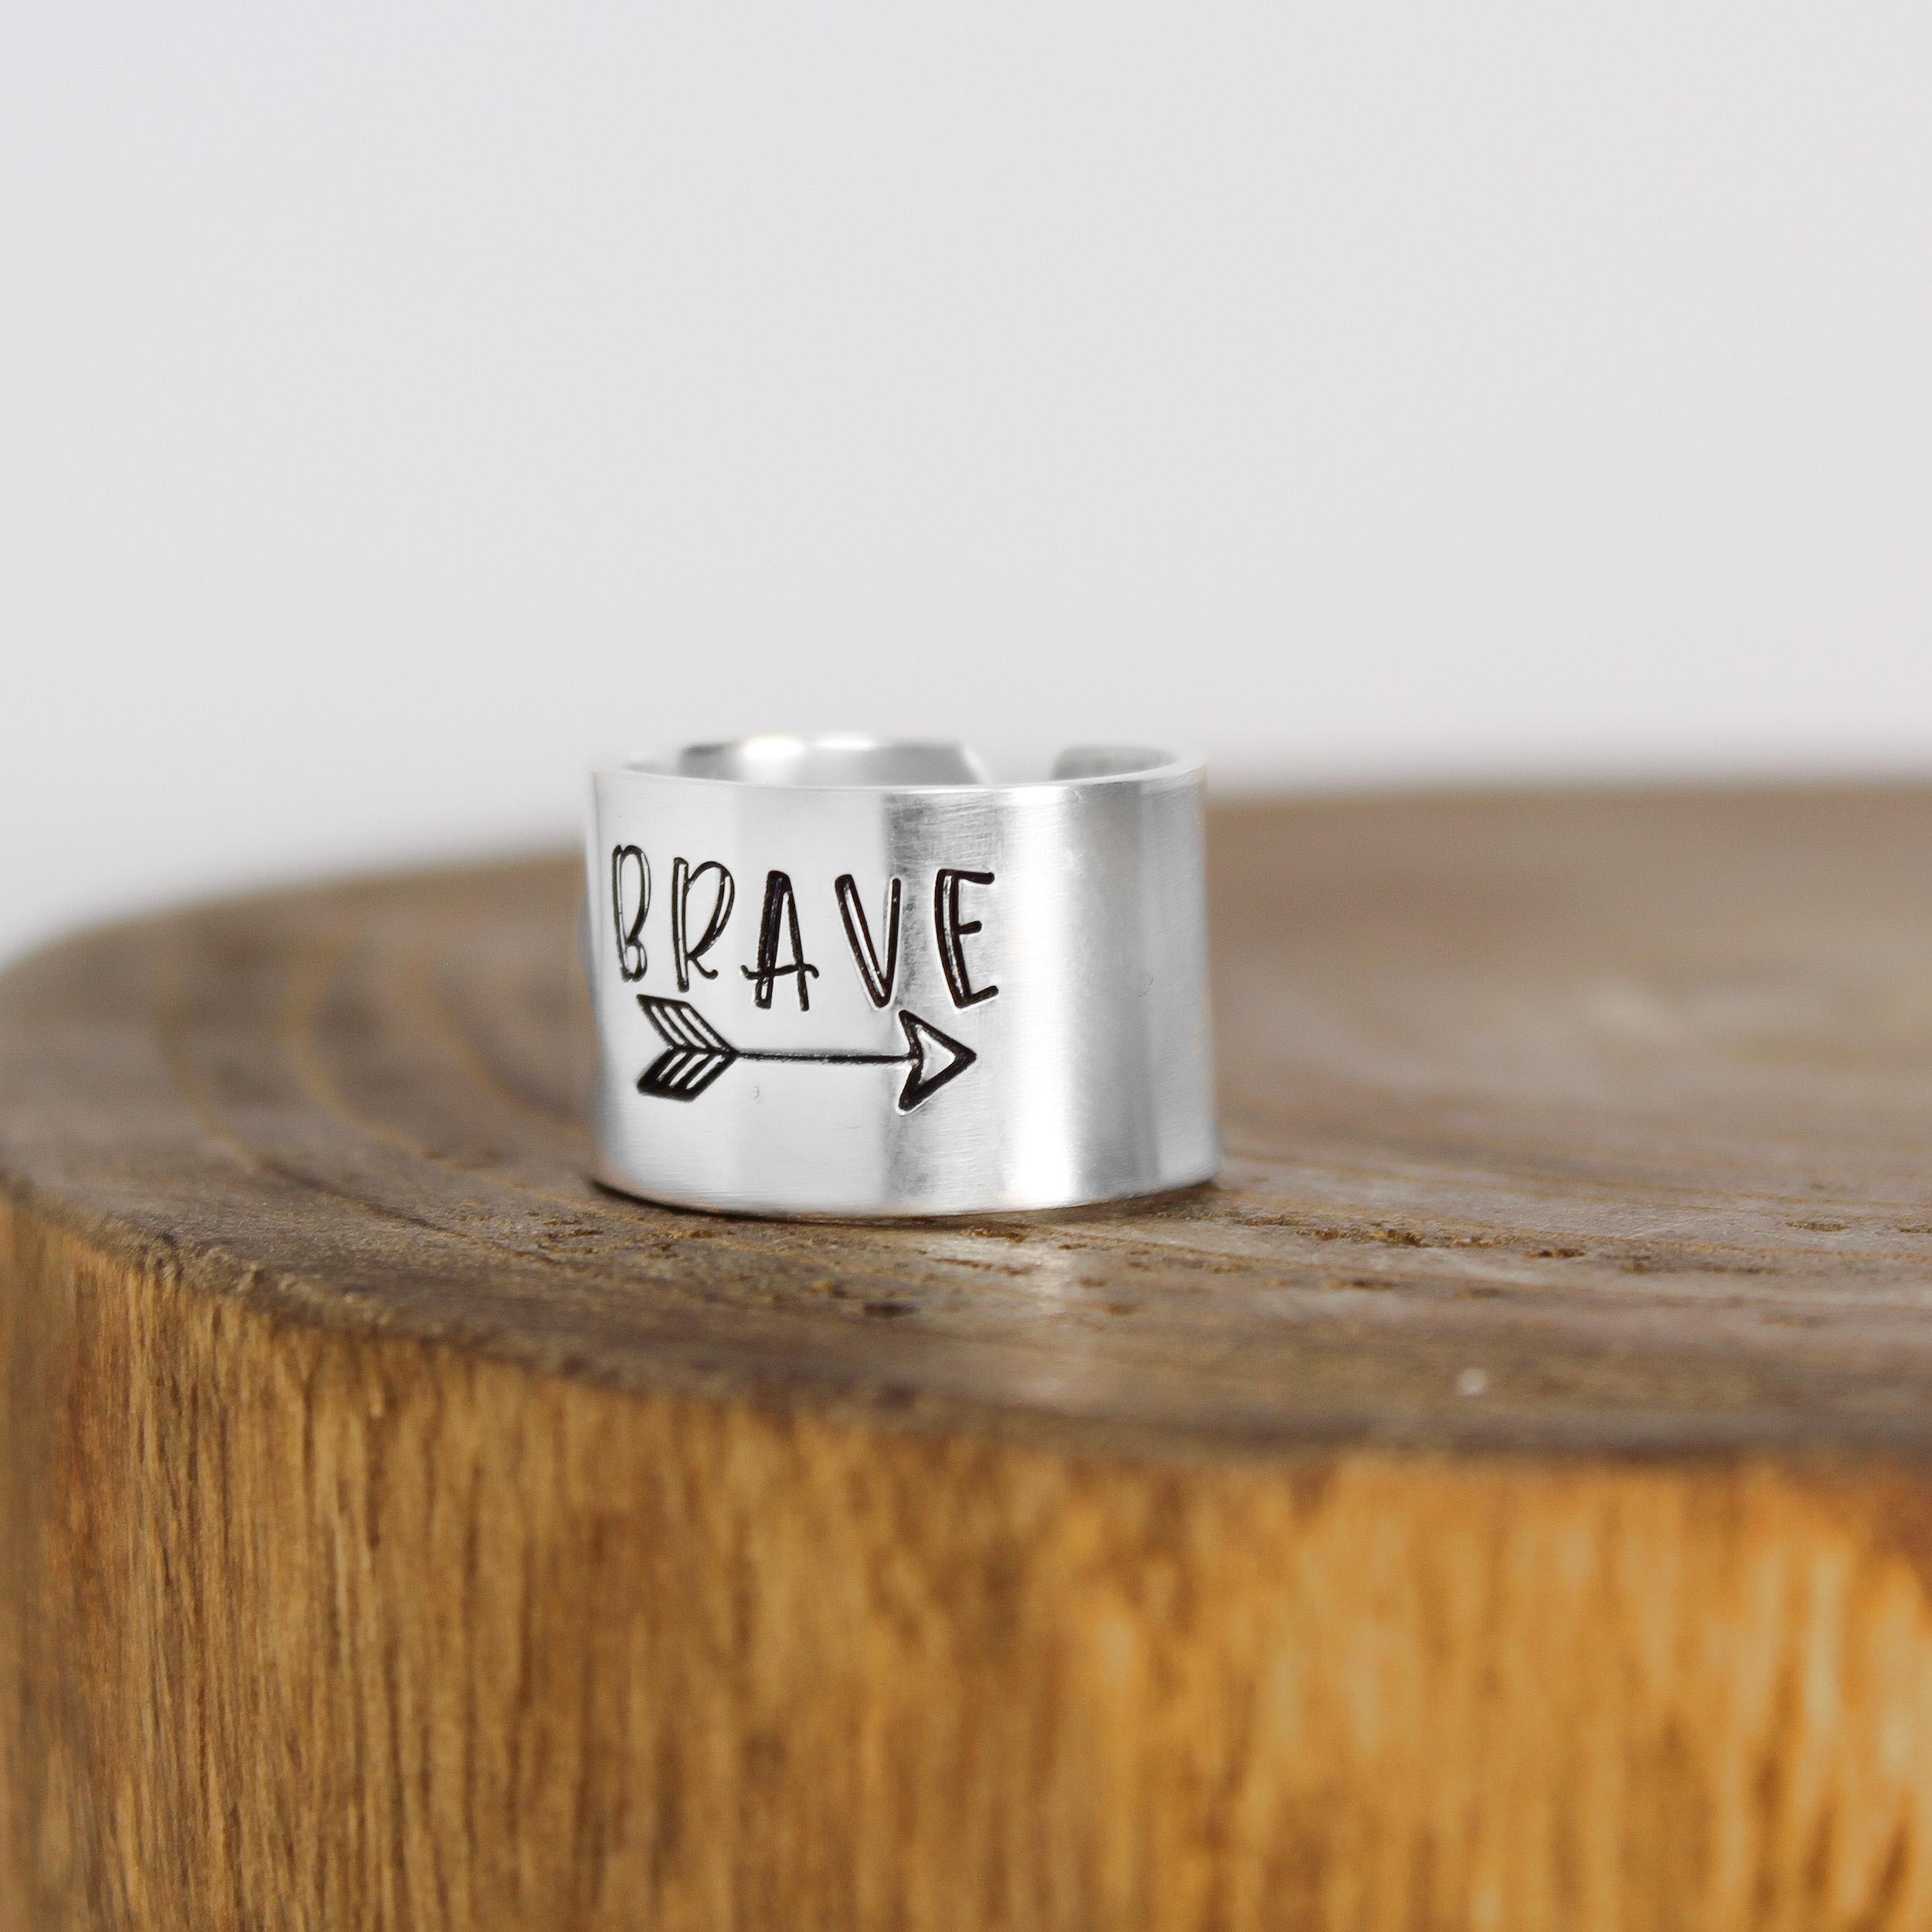 Brave Ring Sterling Silver